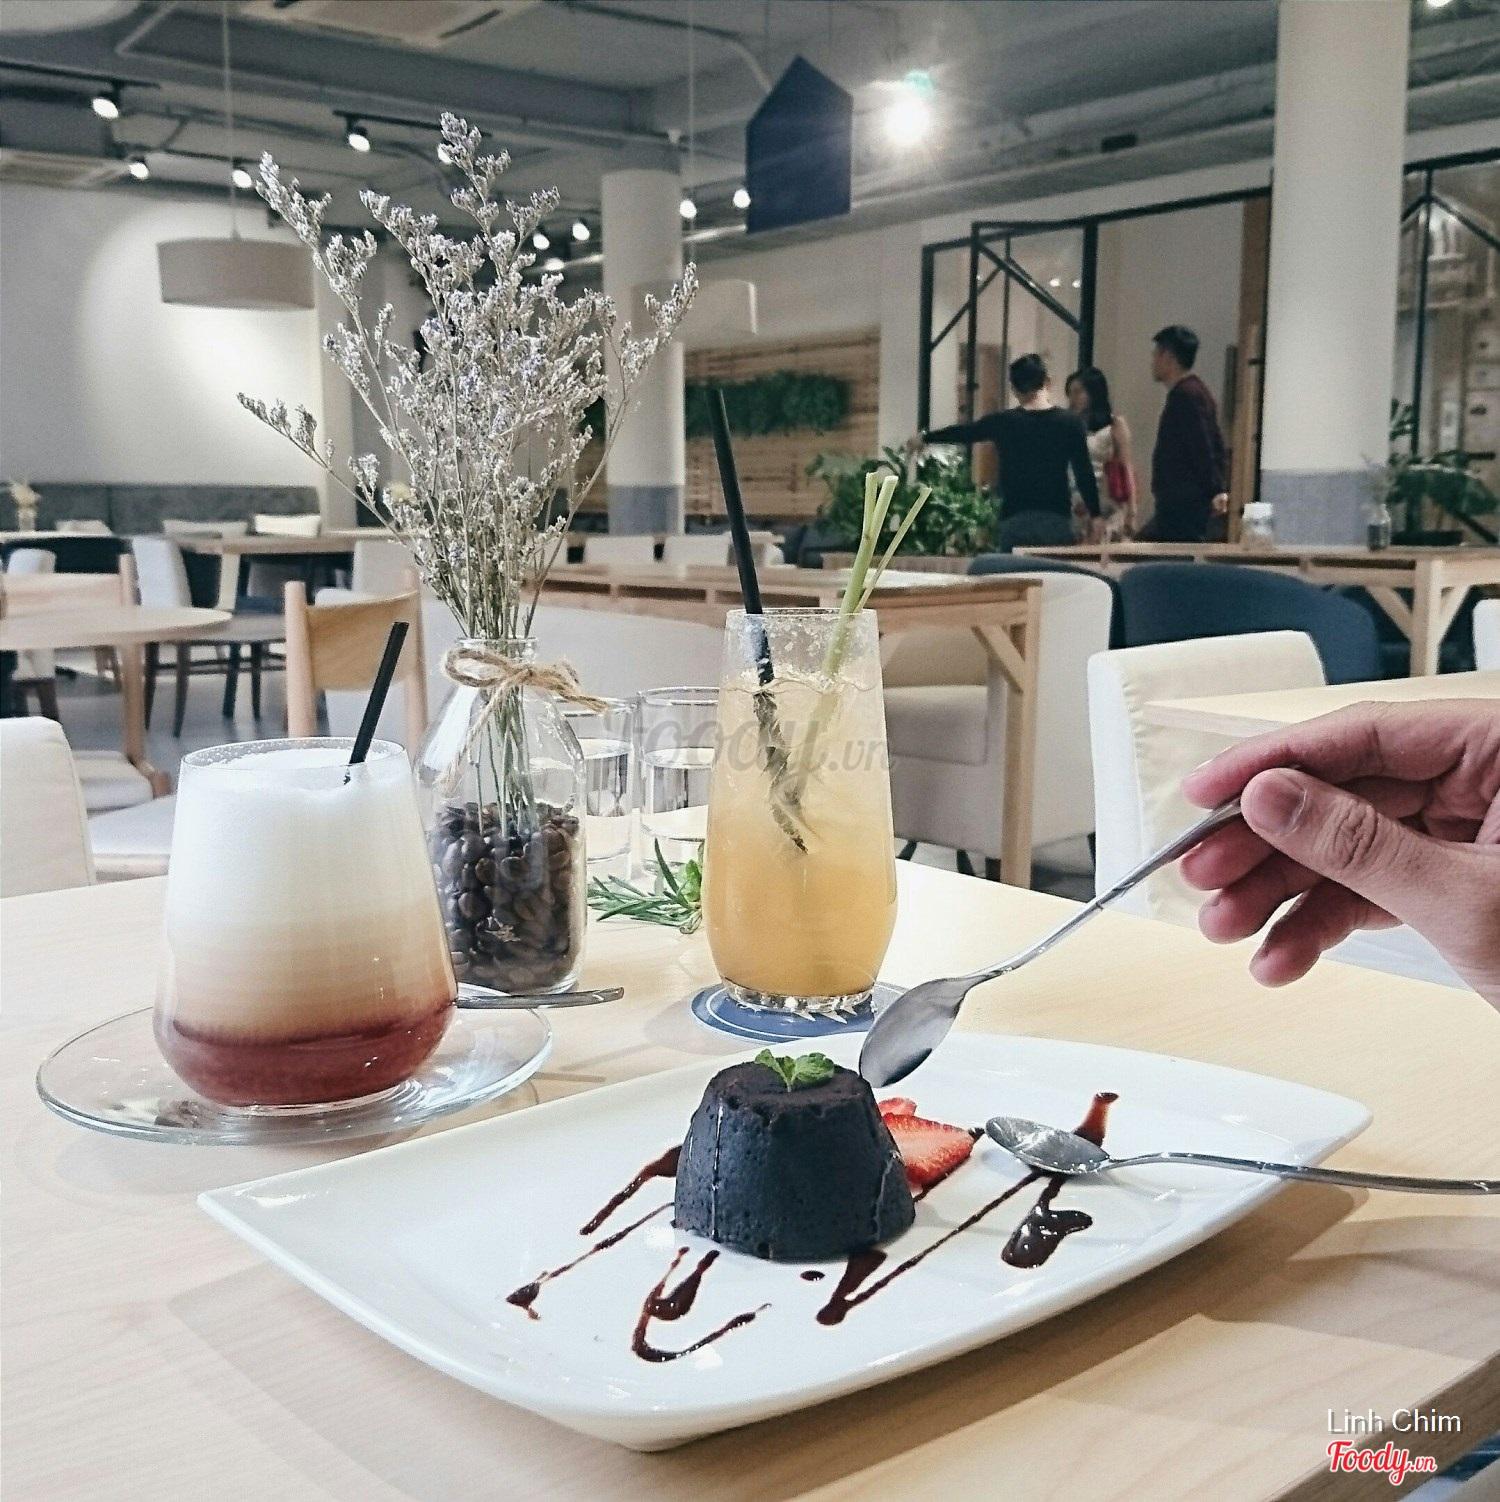 Linh Chim · Kitchenette Cafe Tầng 3, 52 Nguyễn Chí Thanh ...